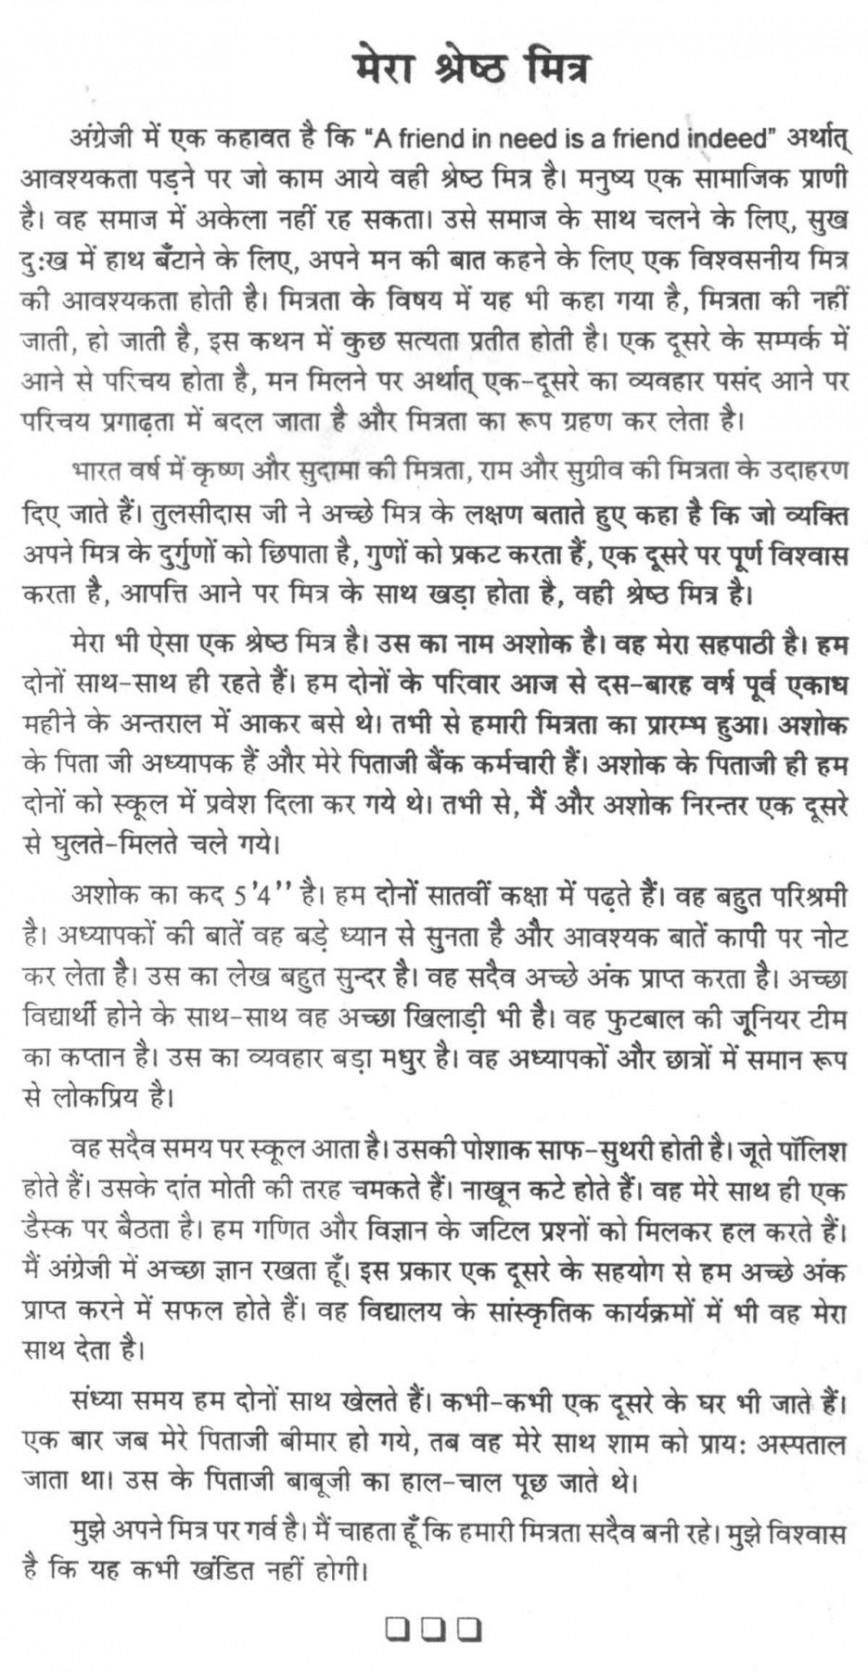 001 Essay Example Qualities Of Good Friend Thumb Teacher Great Characteristics Pdf In Hindi Three Free Language Urdu Exceptional A Short